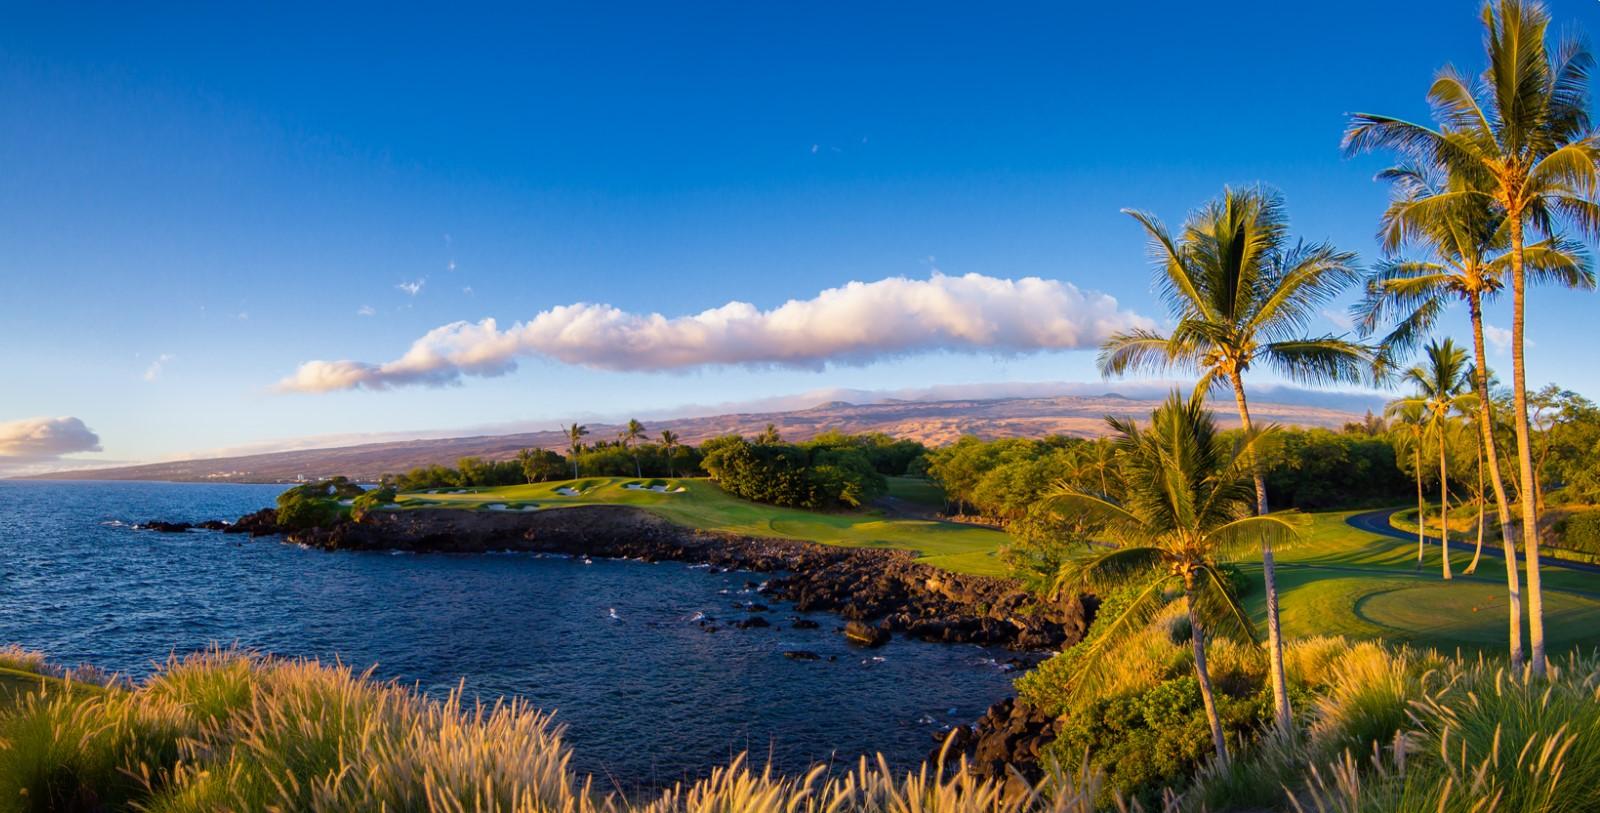 Image of Hotel Exterior & Beach, Mauna Kea Beach Hotel, Kohala Coast, Hawaii, 1965, Member of Historic Hotels of America, Golf